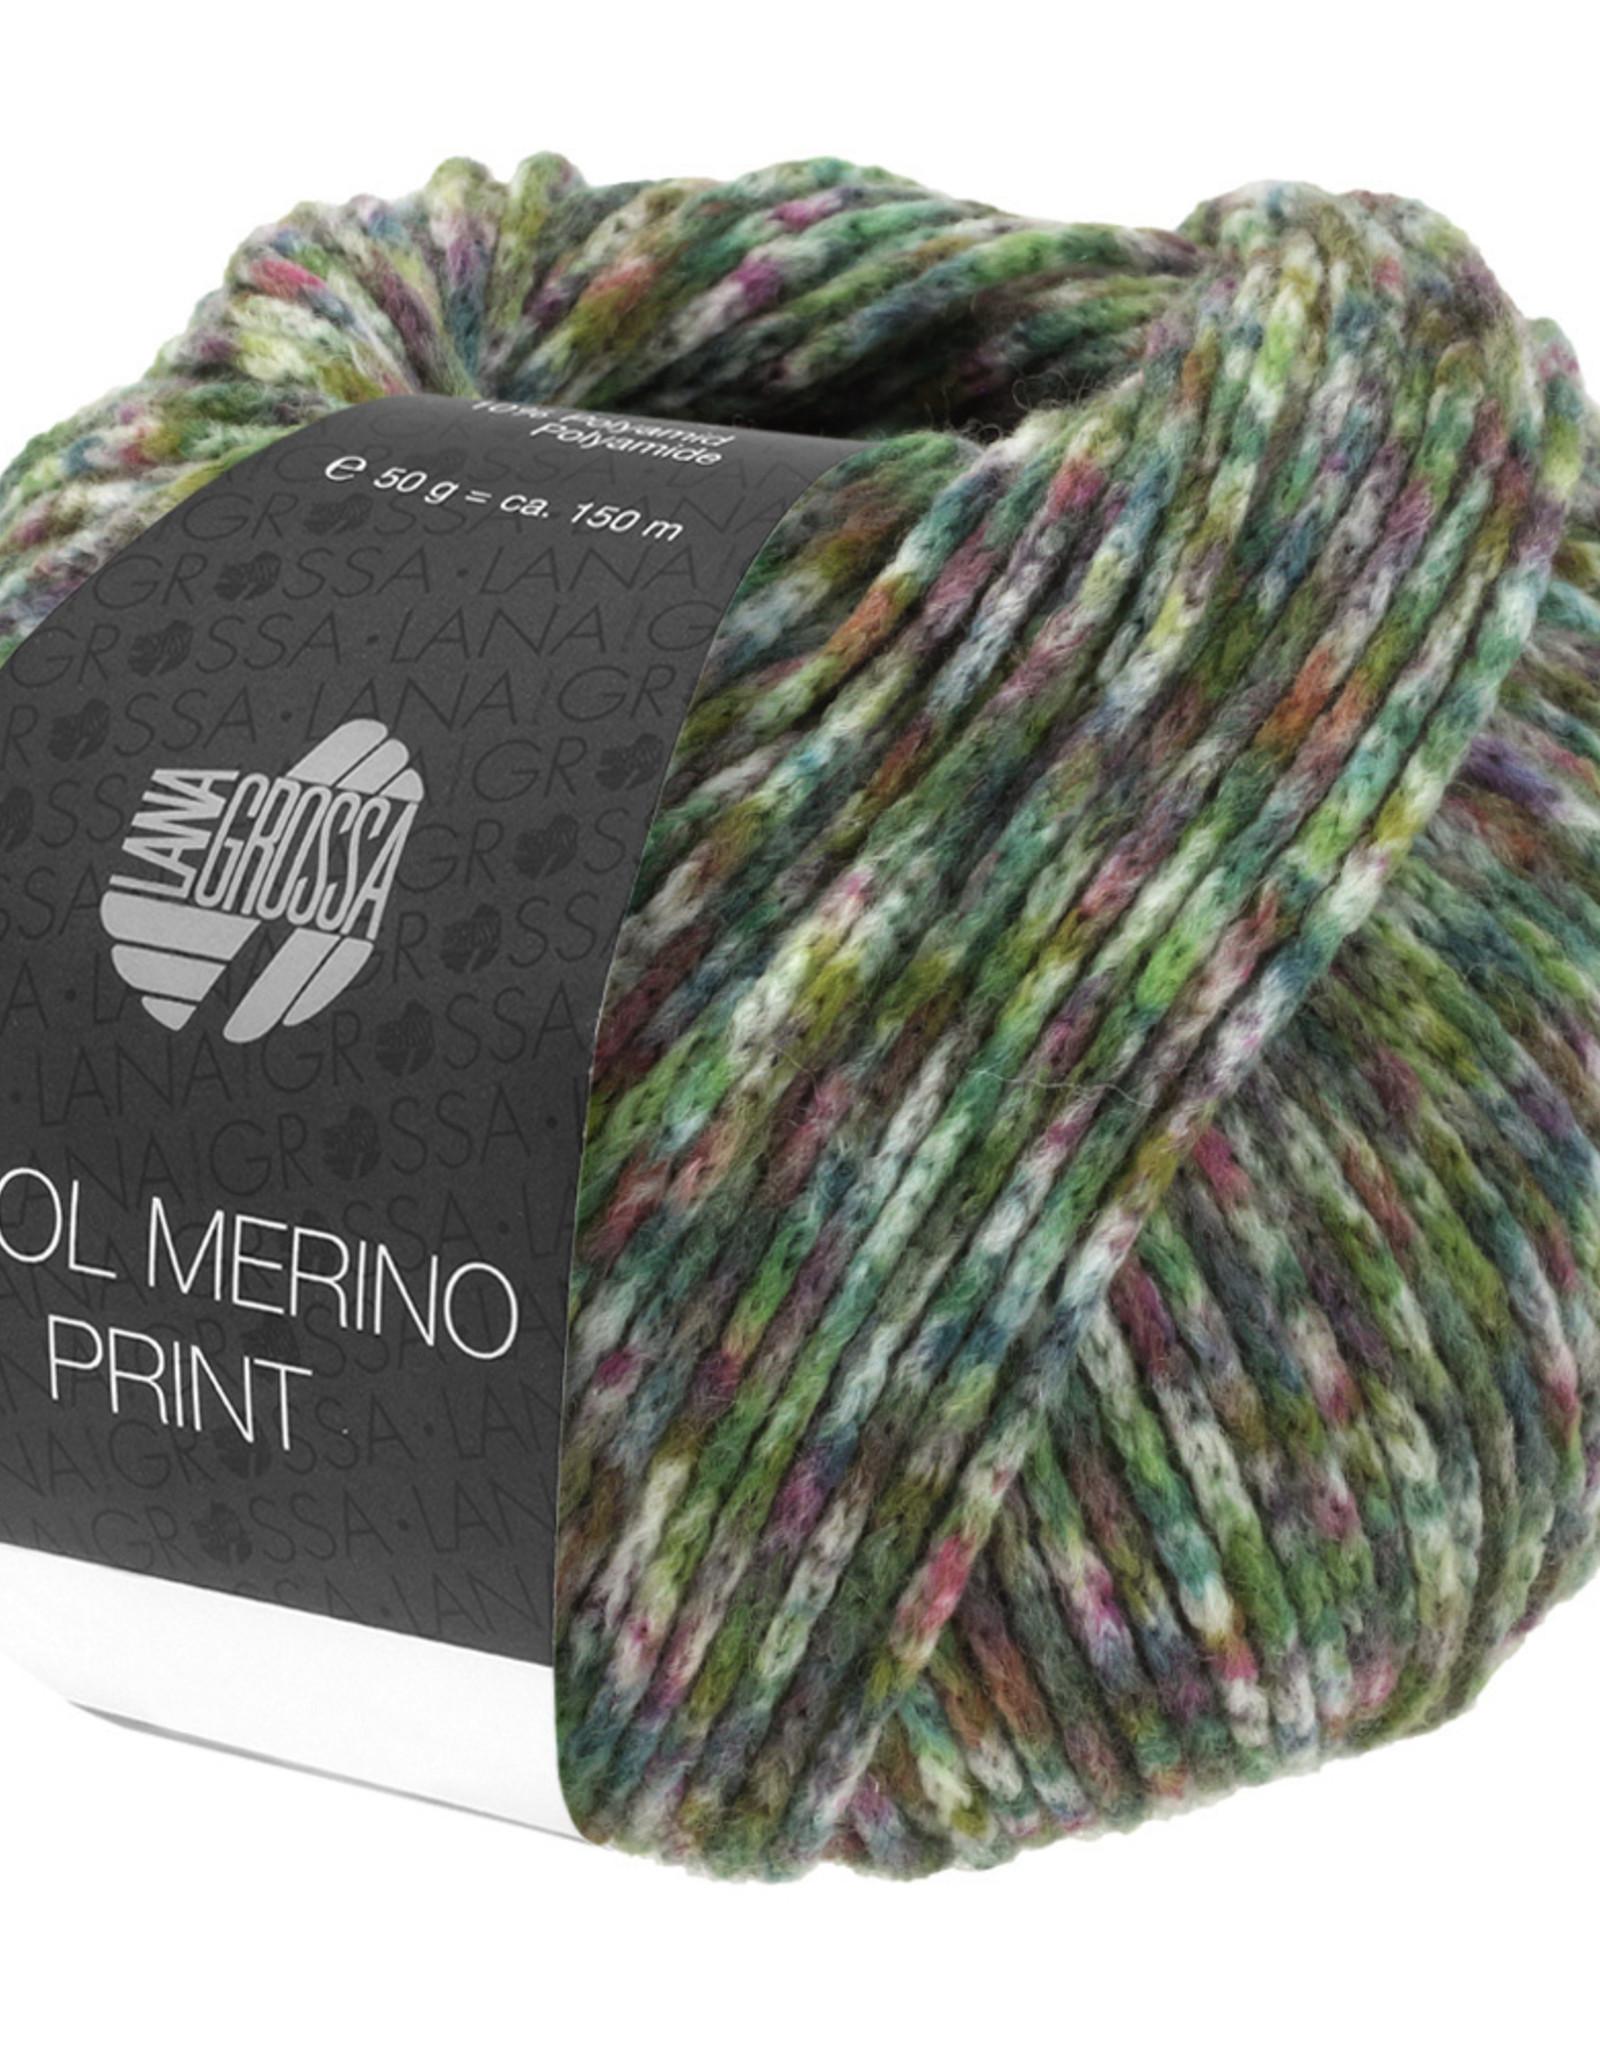 Lana Grossa Cool Merino/ Print